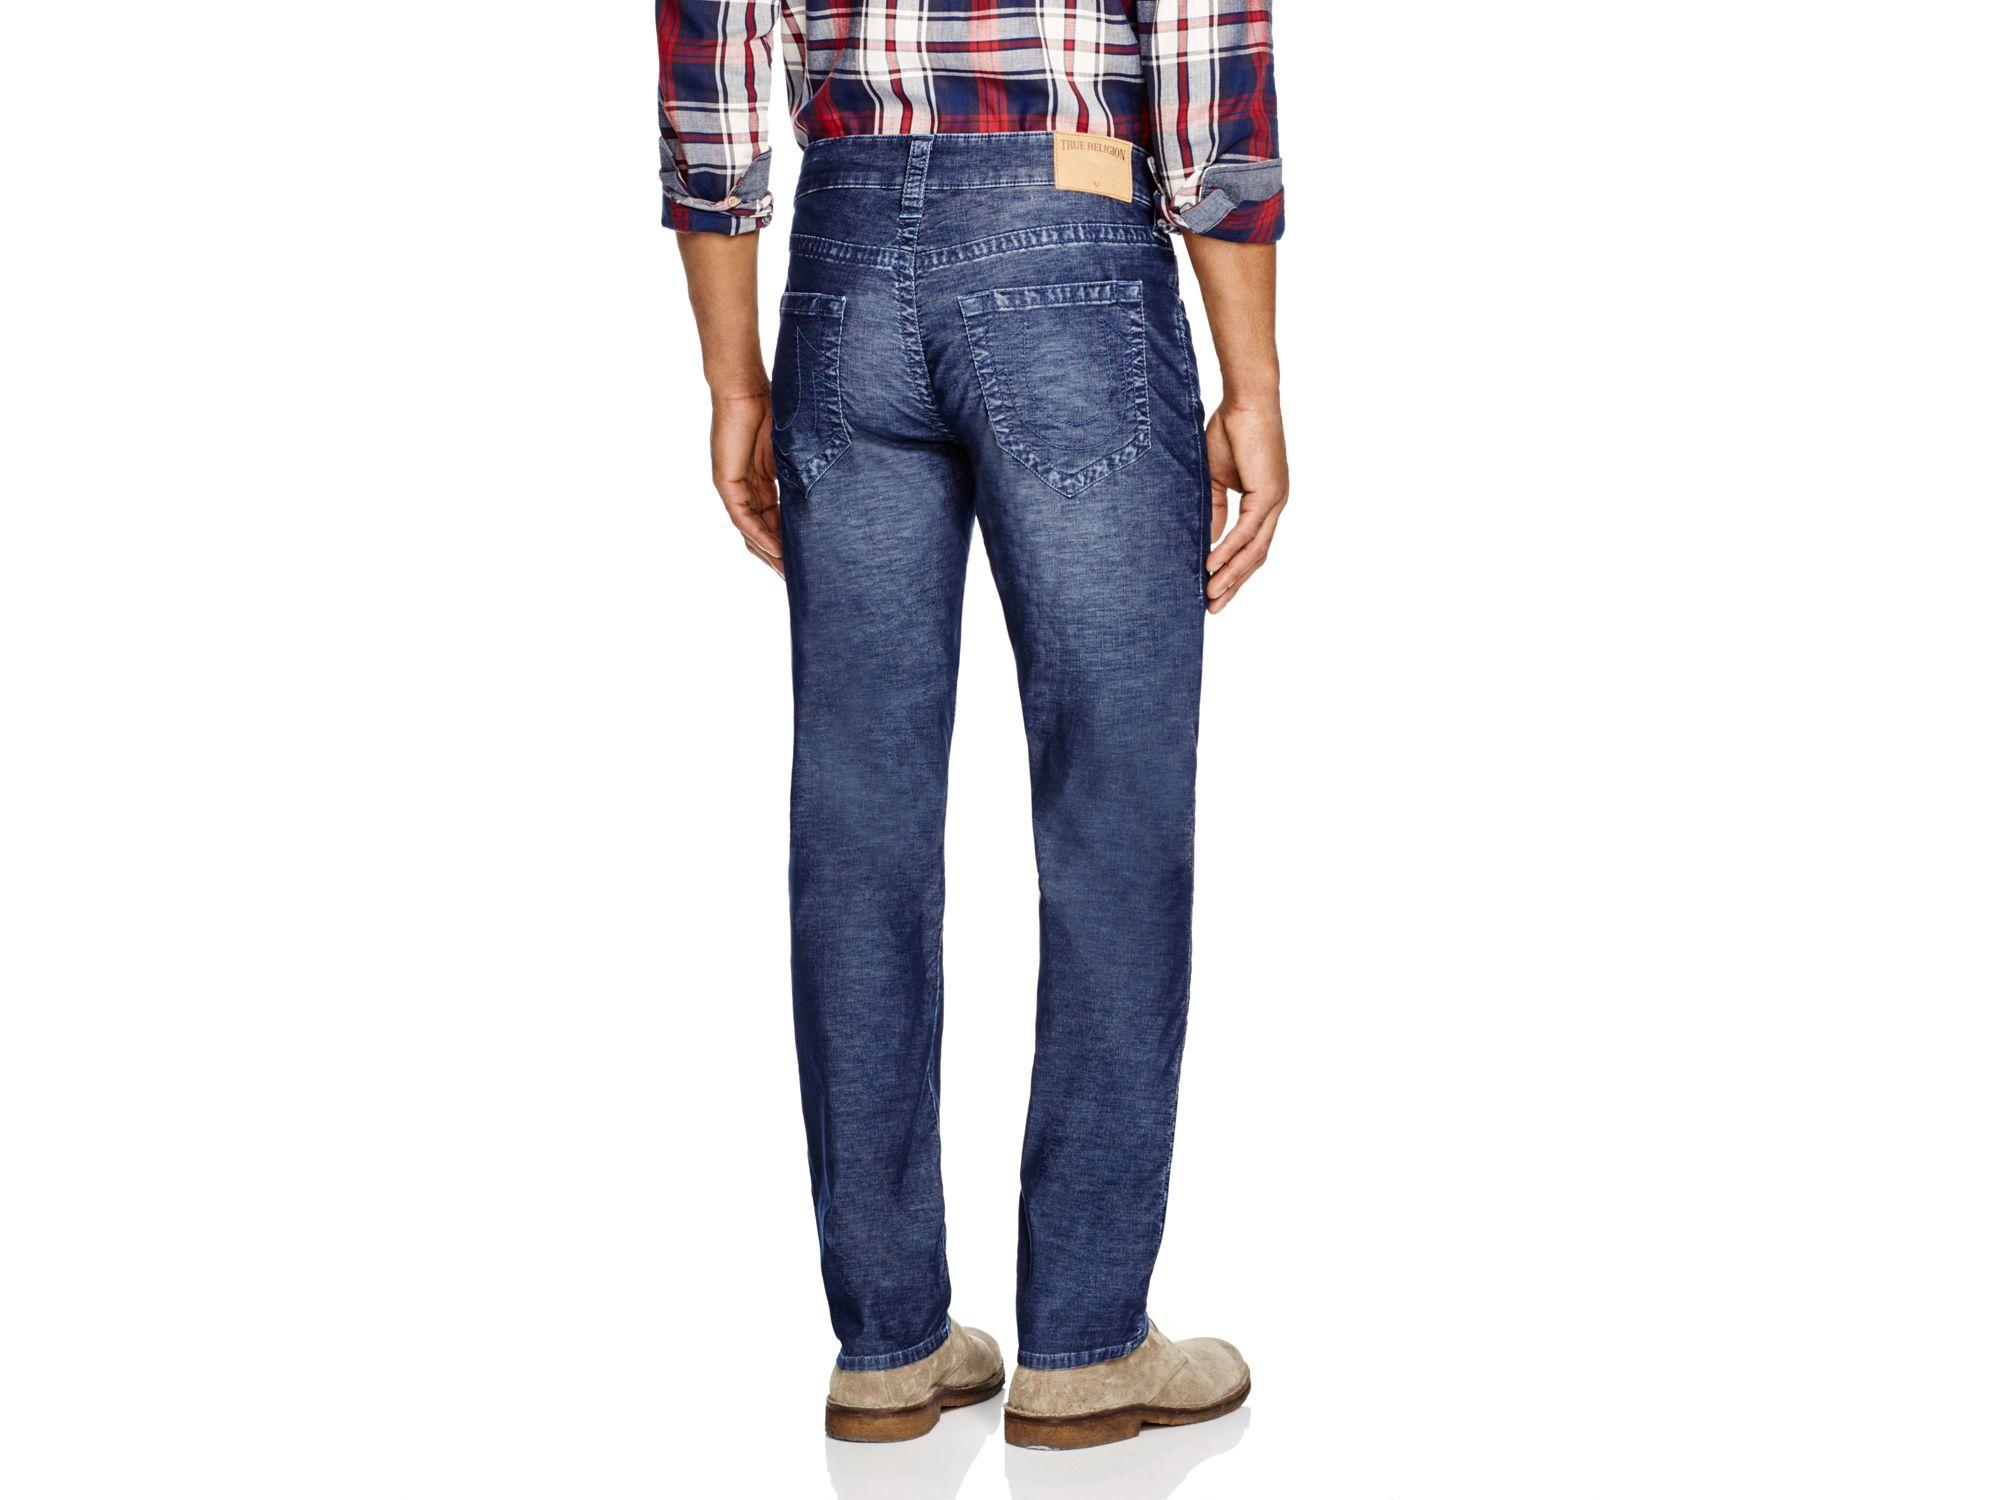 True Religion Denim Geno Straight Fit Jeans In Midnight Blue for Men